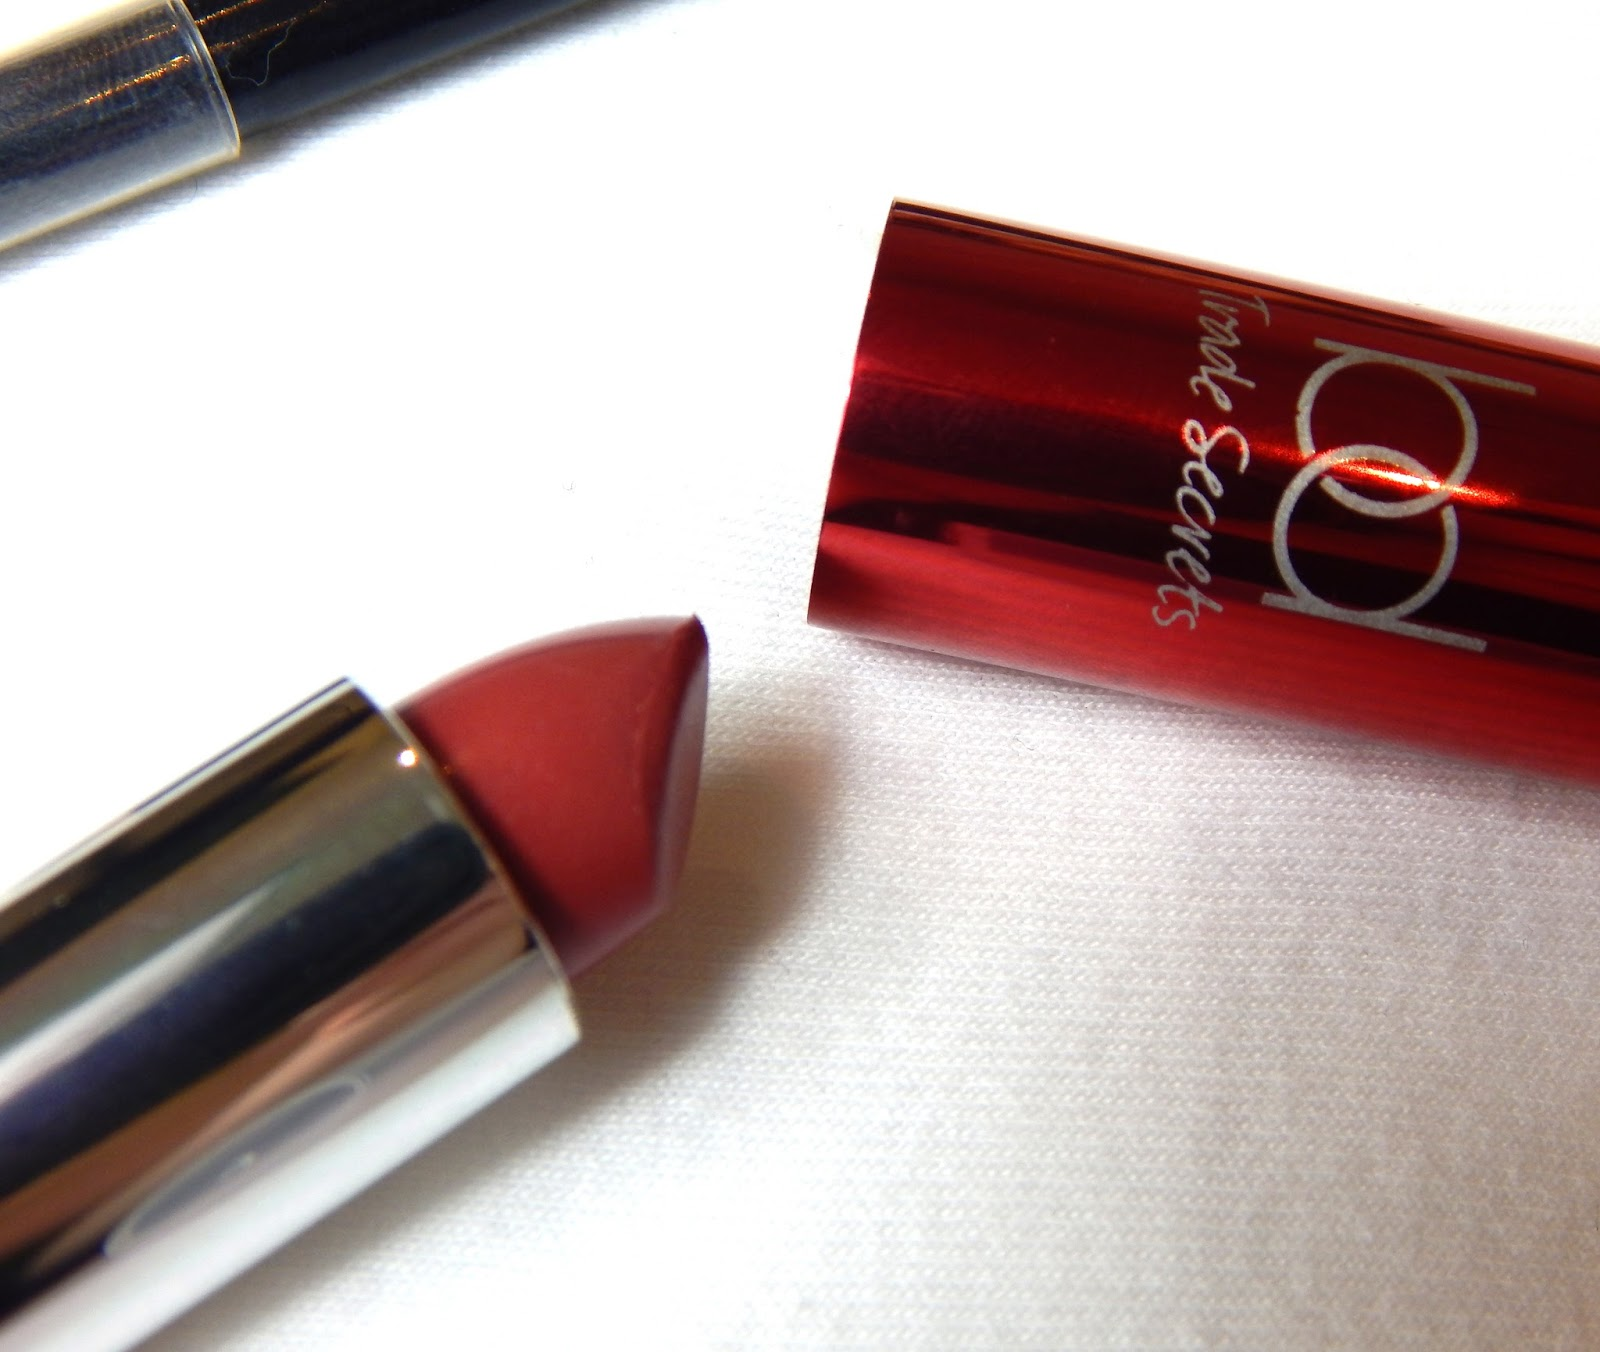 Bd Trade Secrets - Beauty at Tesco, shemightbeloved, beauty blog